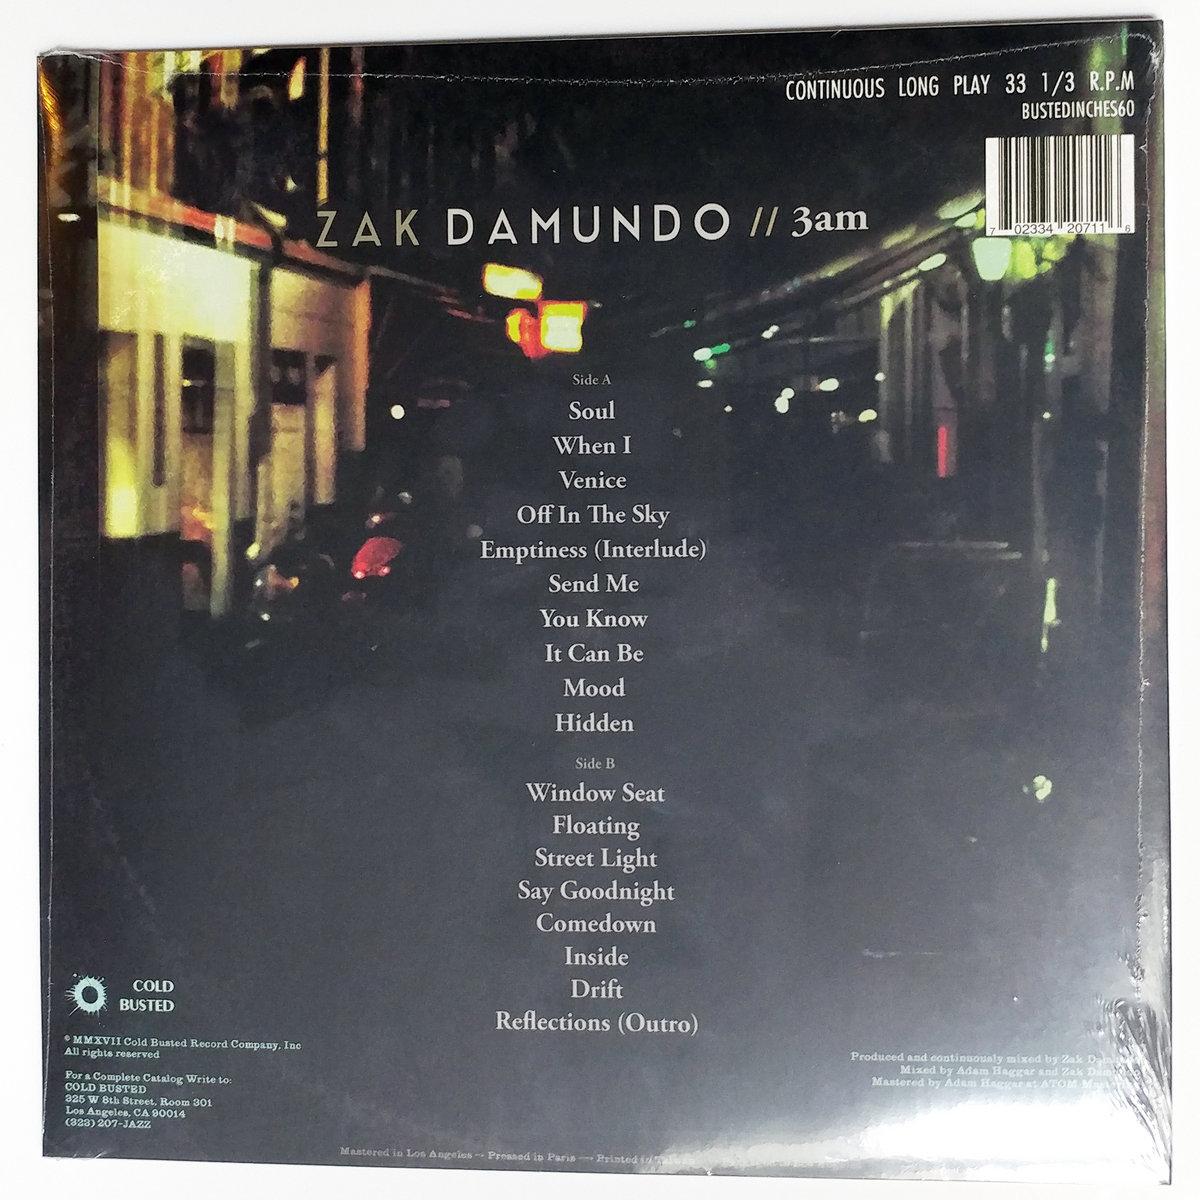 3am | Zak Damundo